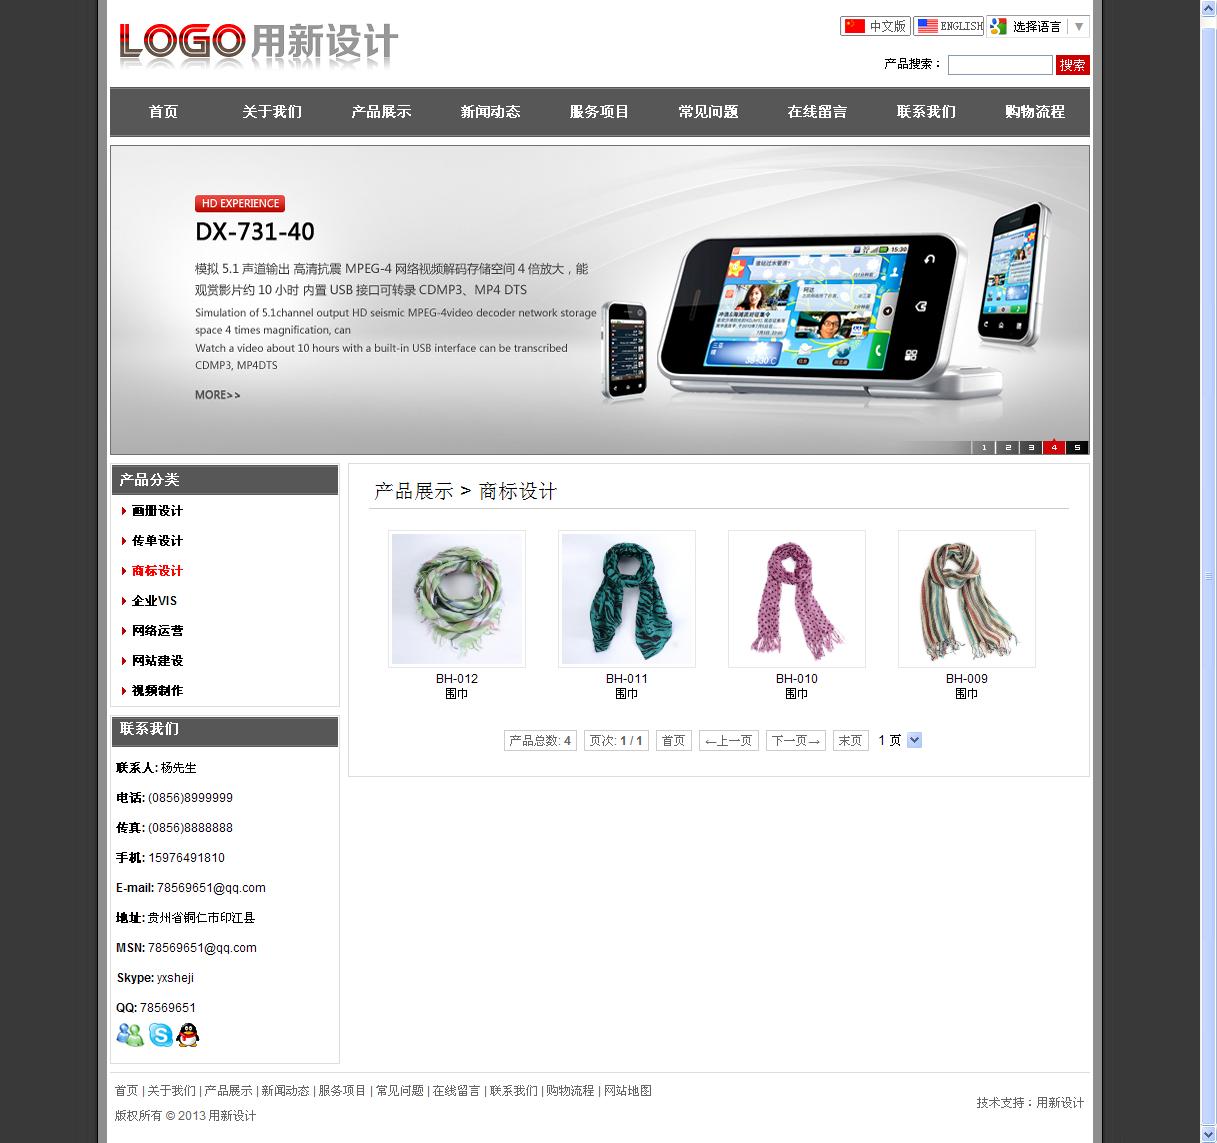 【asp】淘宝在卖的ASP中英双语企业网站源码(可生成HTML)